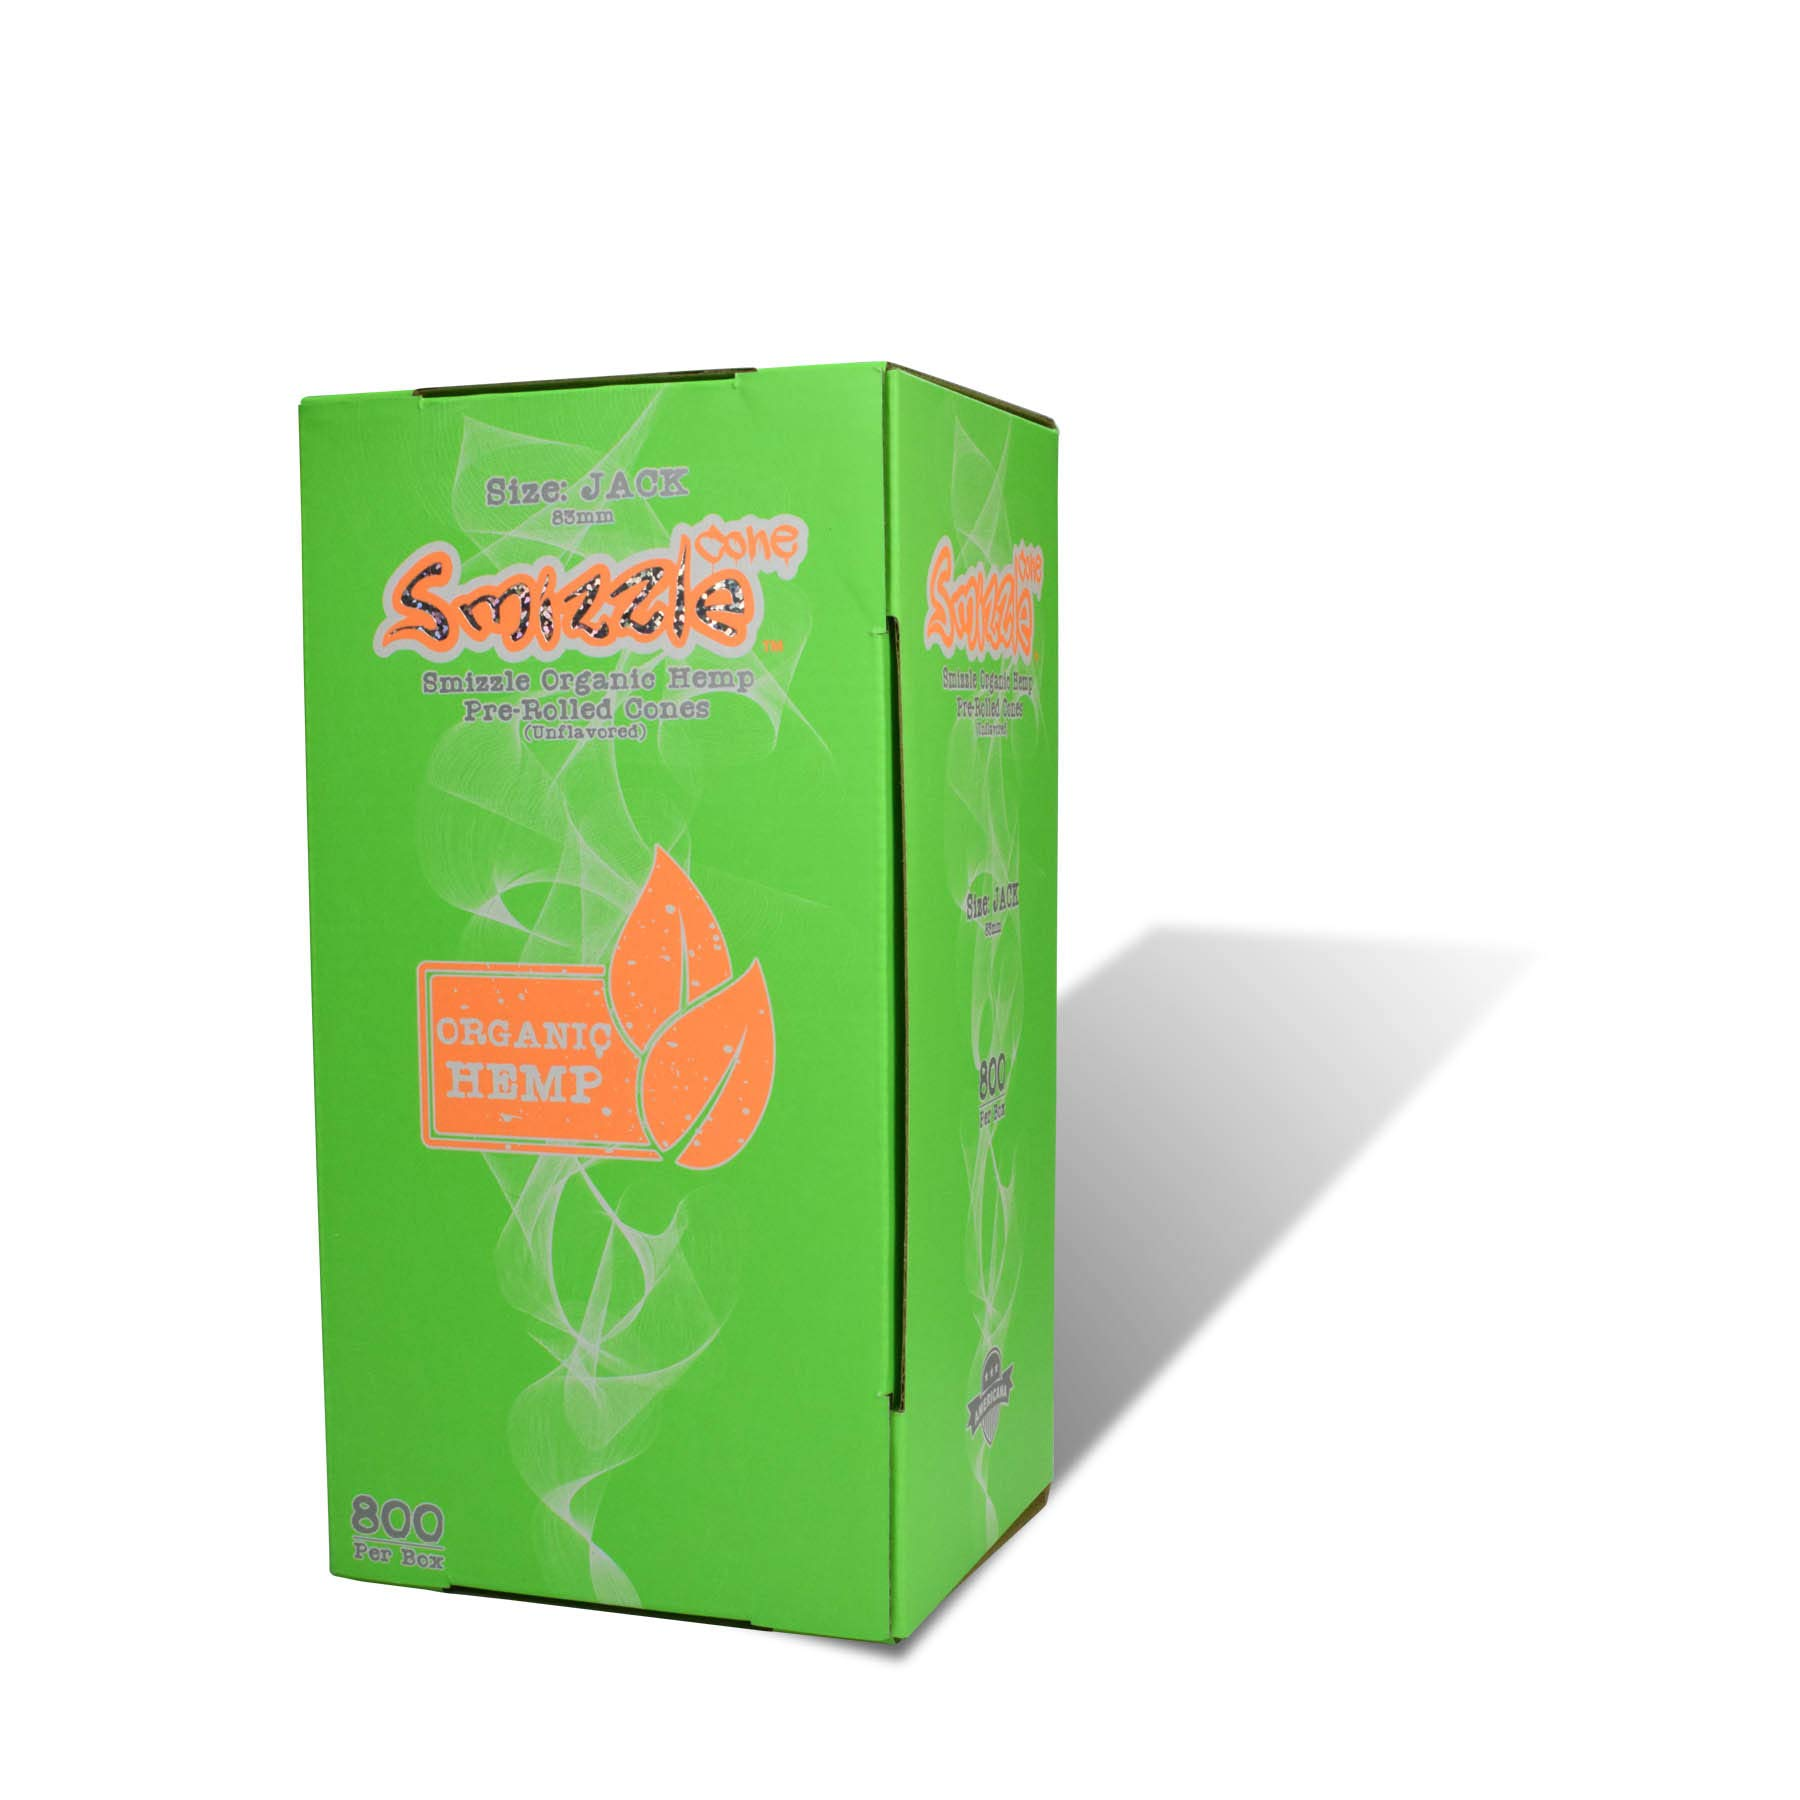 SMIZZLE 800 ct Pre-Rolled Organic Hemp Cones, Jack 1-1/4 (83mm) Tower Bulk Pack Tower Bulk Pack for Dispensaries by Smizzle